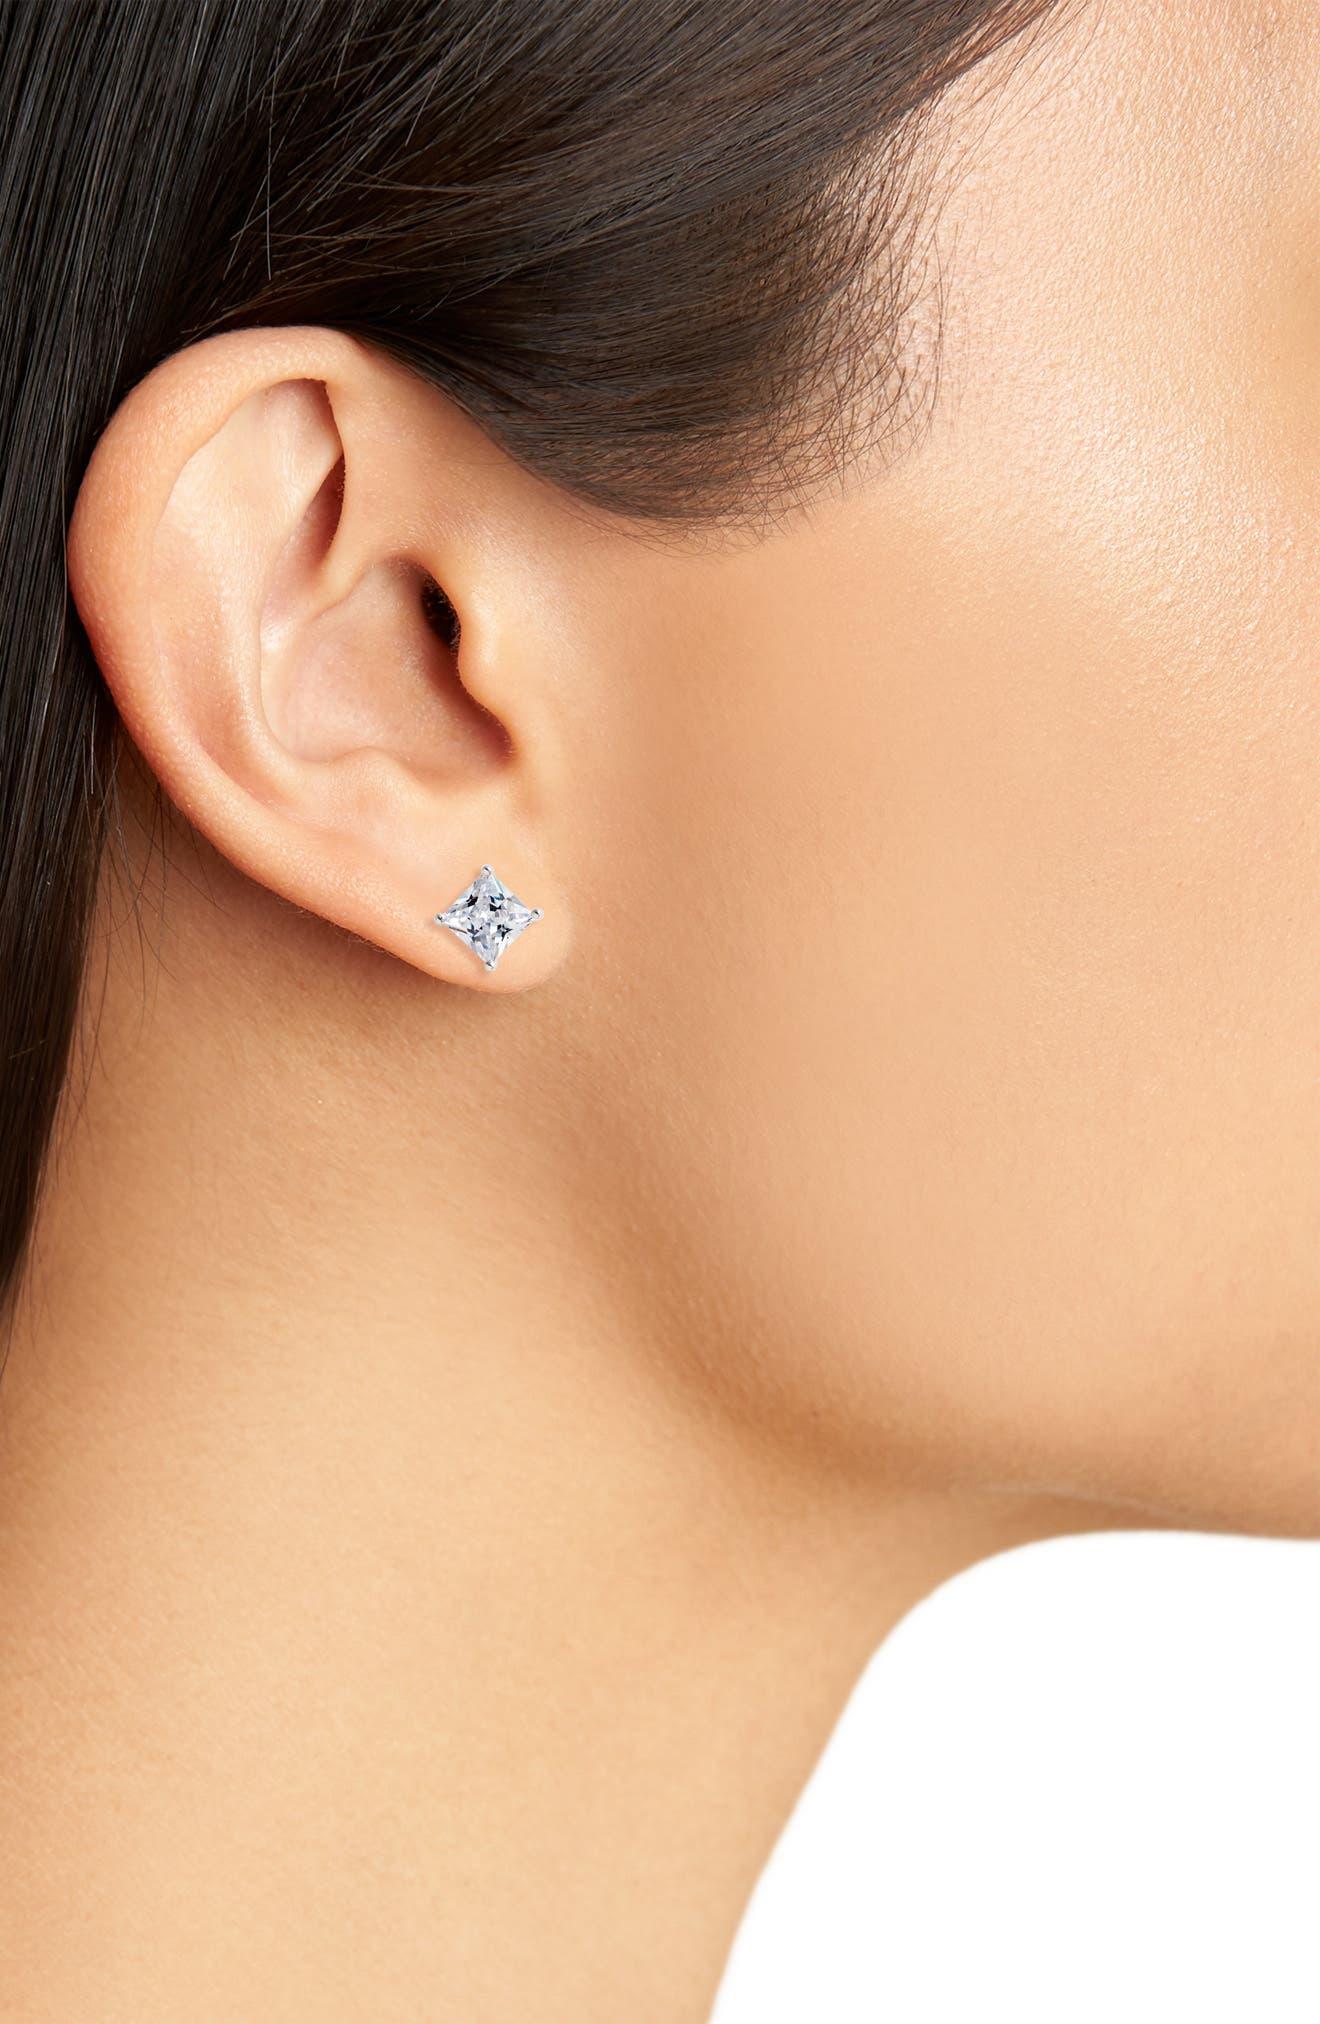 4ct tw Princess Cut Cubic Zirconia Stud Earrings,                             Alternate thumbnail 2, color,                             040